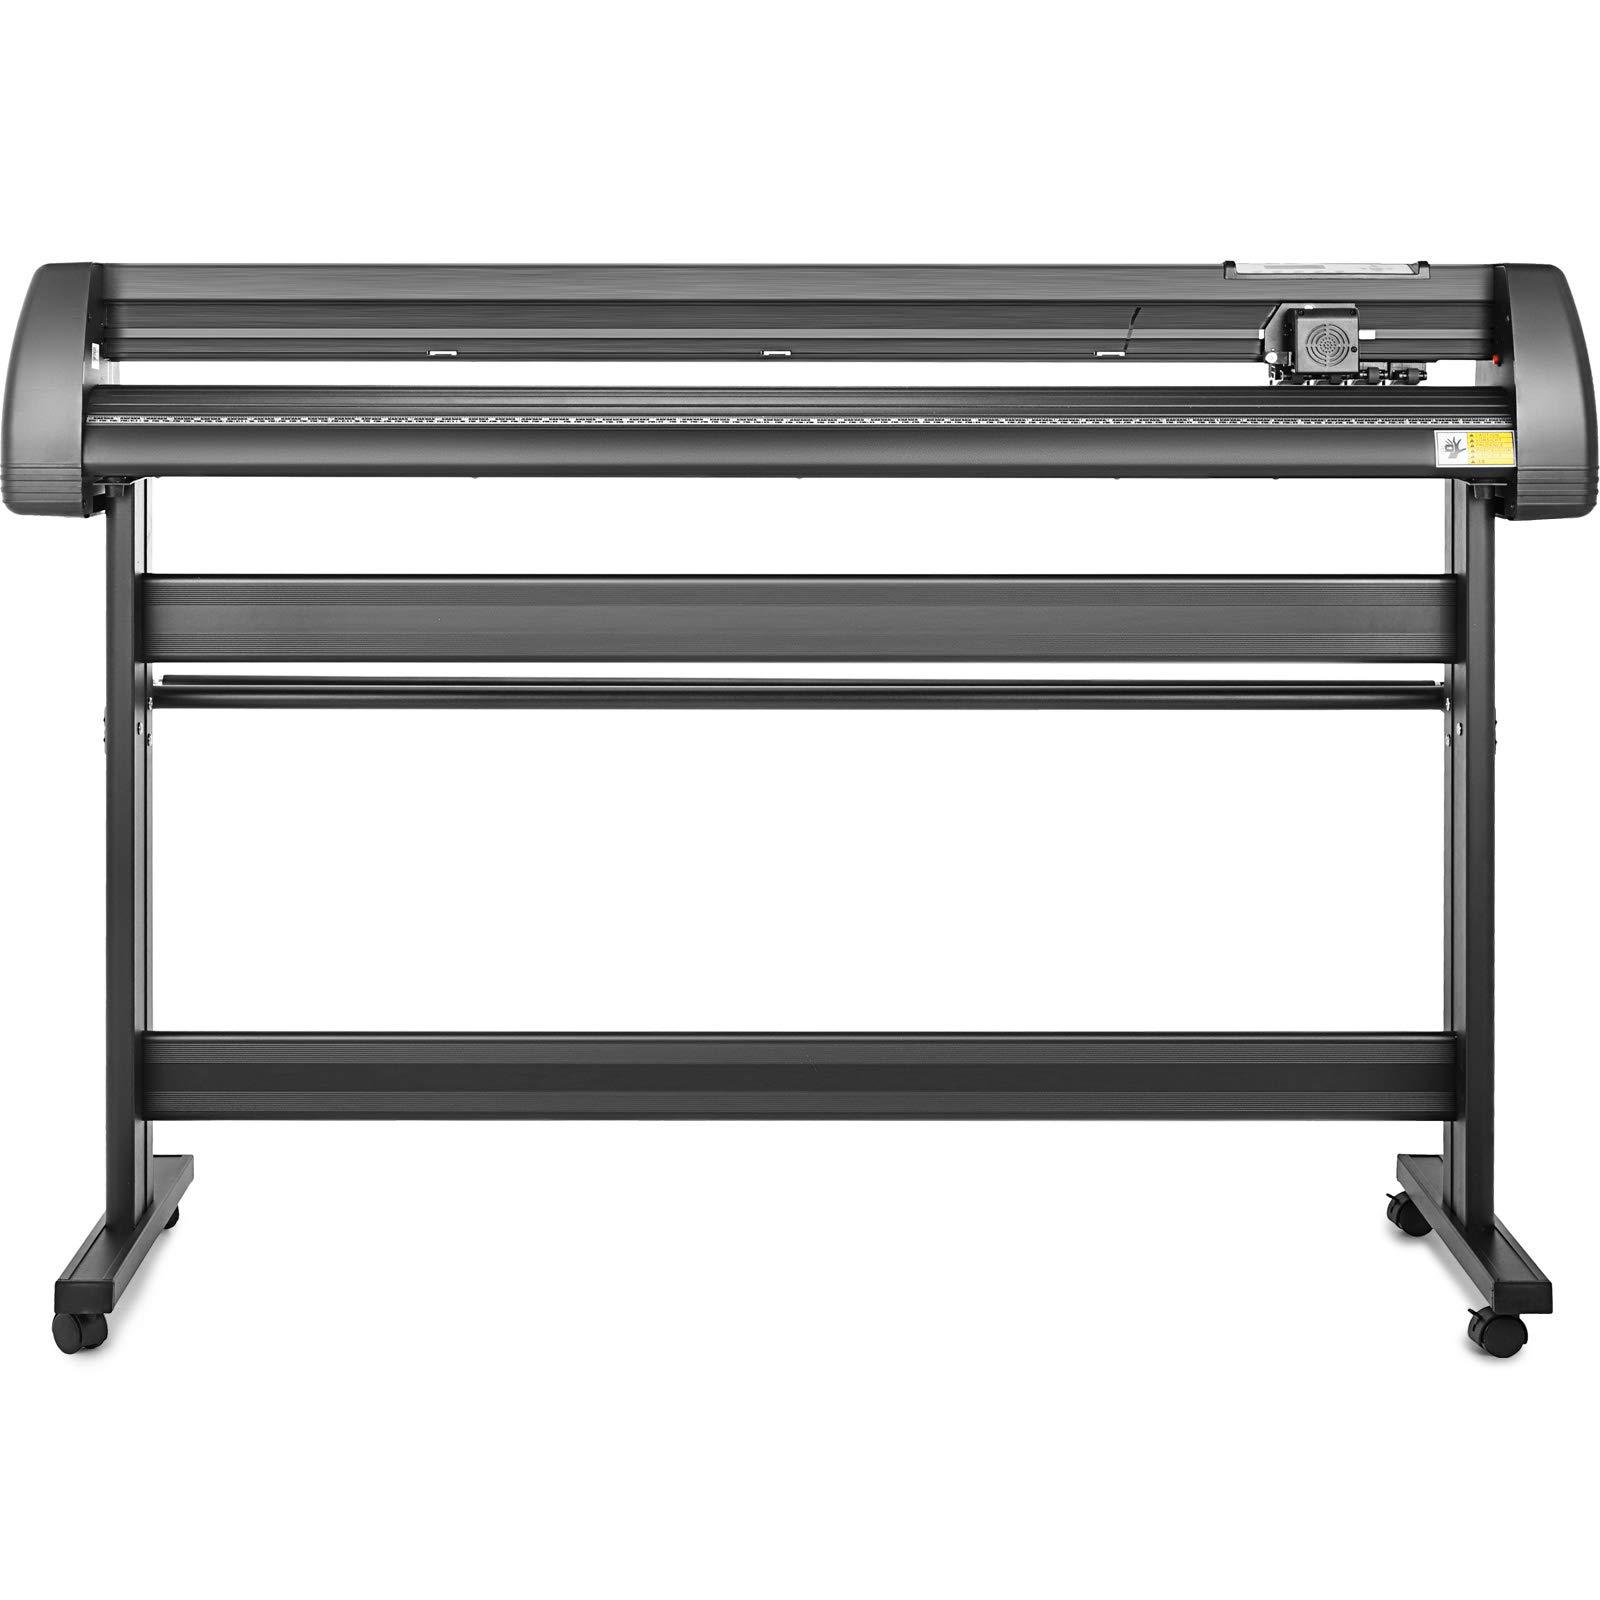 VEVOR Vinyl Cutter 53 inch Plotter Machine 1340mm Paper Feed Vinyl Cutter Plotter Signmaster Software Sign Making Machinewith Stand (53Inch Style 2) by VEVOR (Image #3)